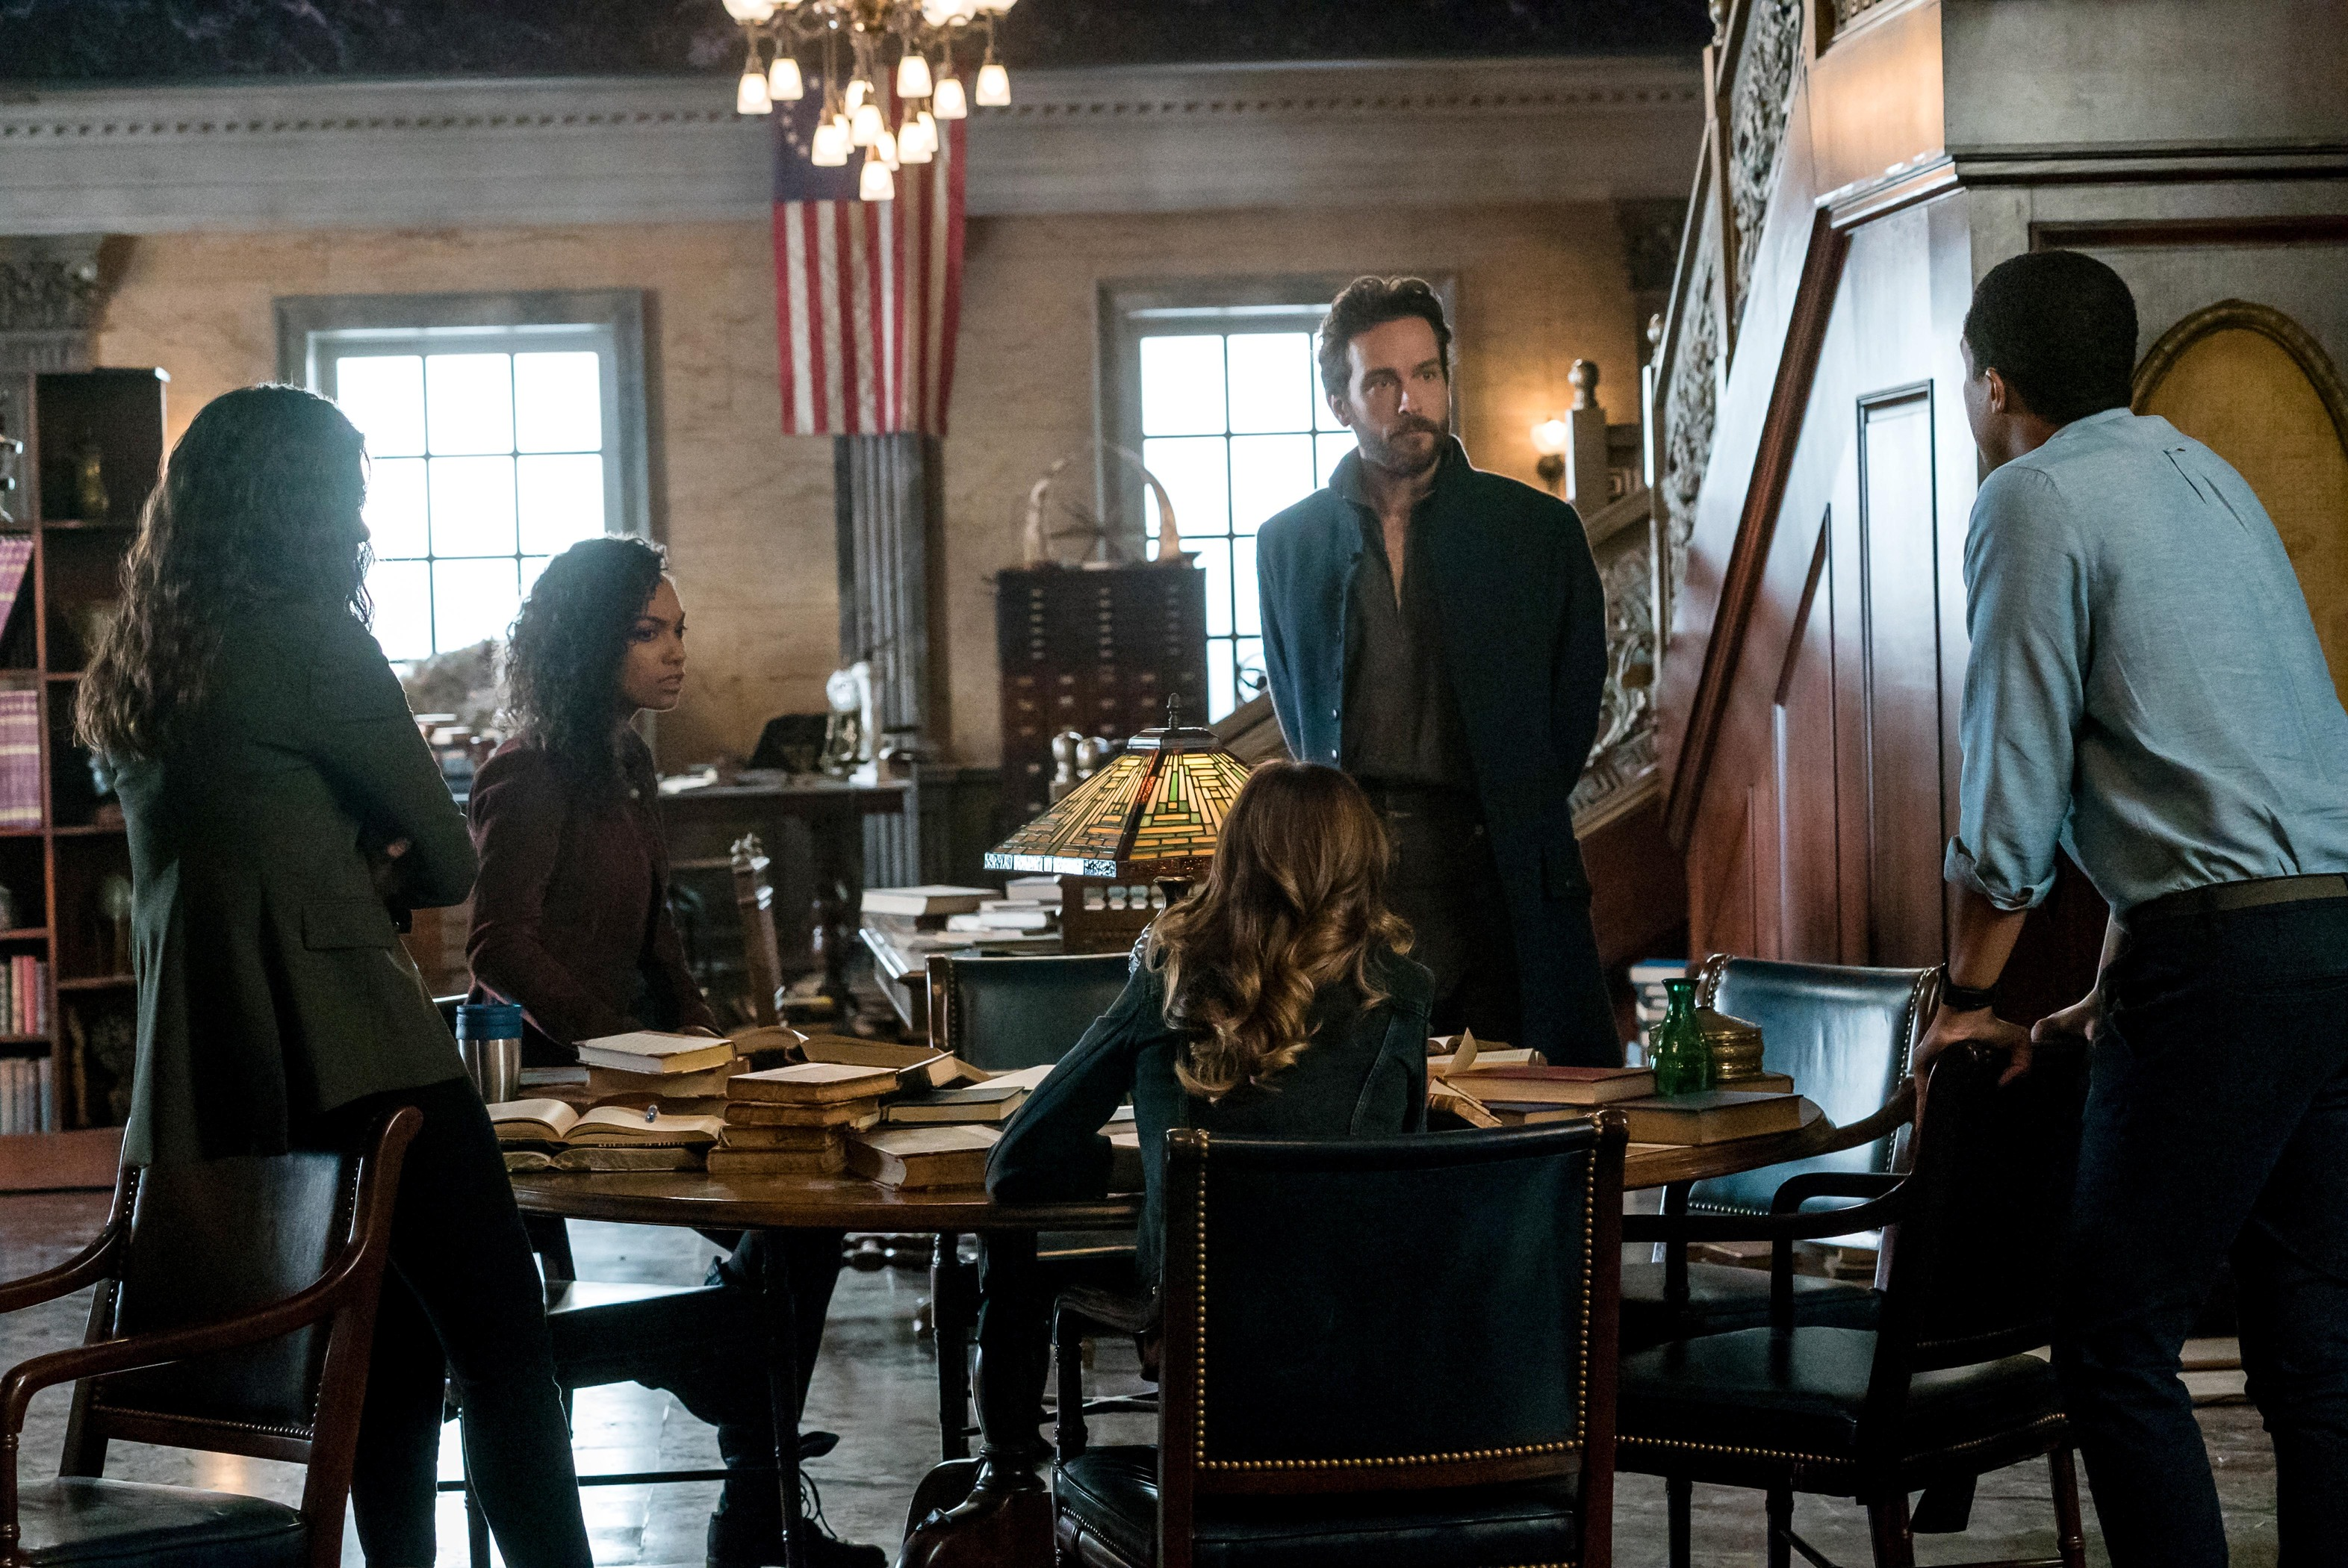 Janina Gavankar, Rachel Melvin, Tom Mison, Lyndie Greenwood, and Jerry MacKinnon in Sleepy Hollow (2013)